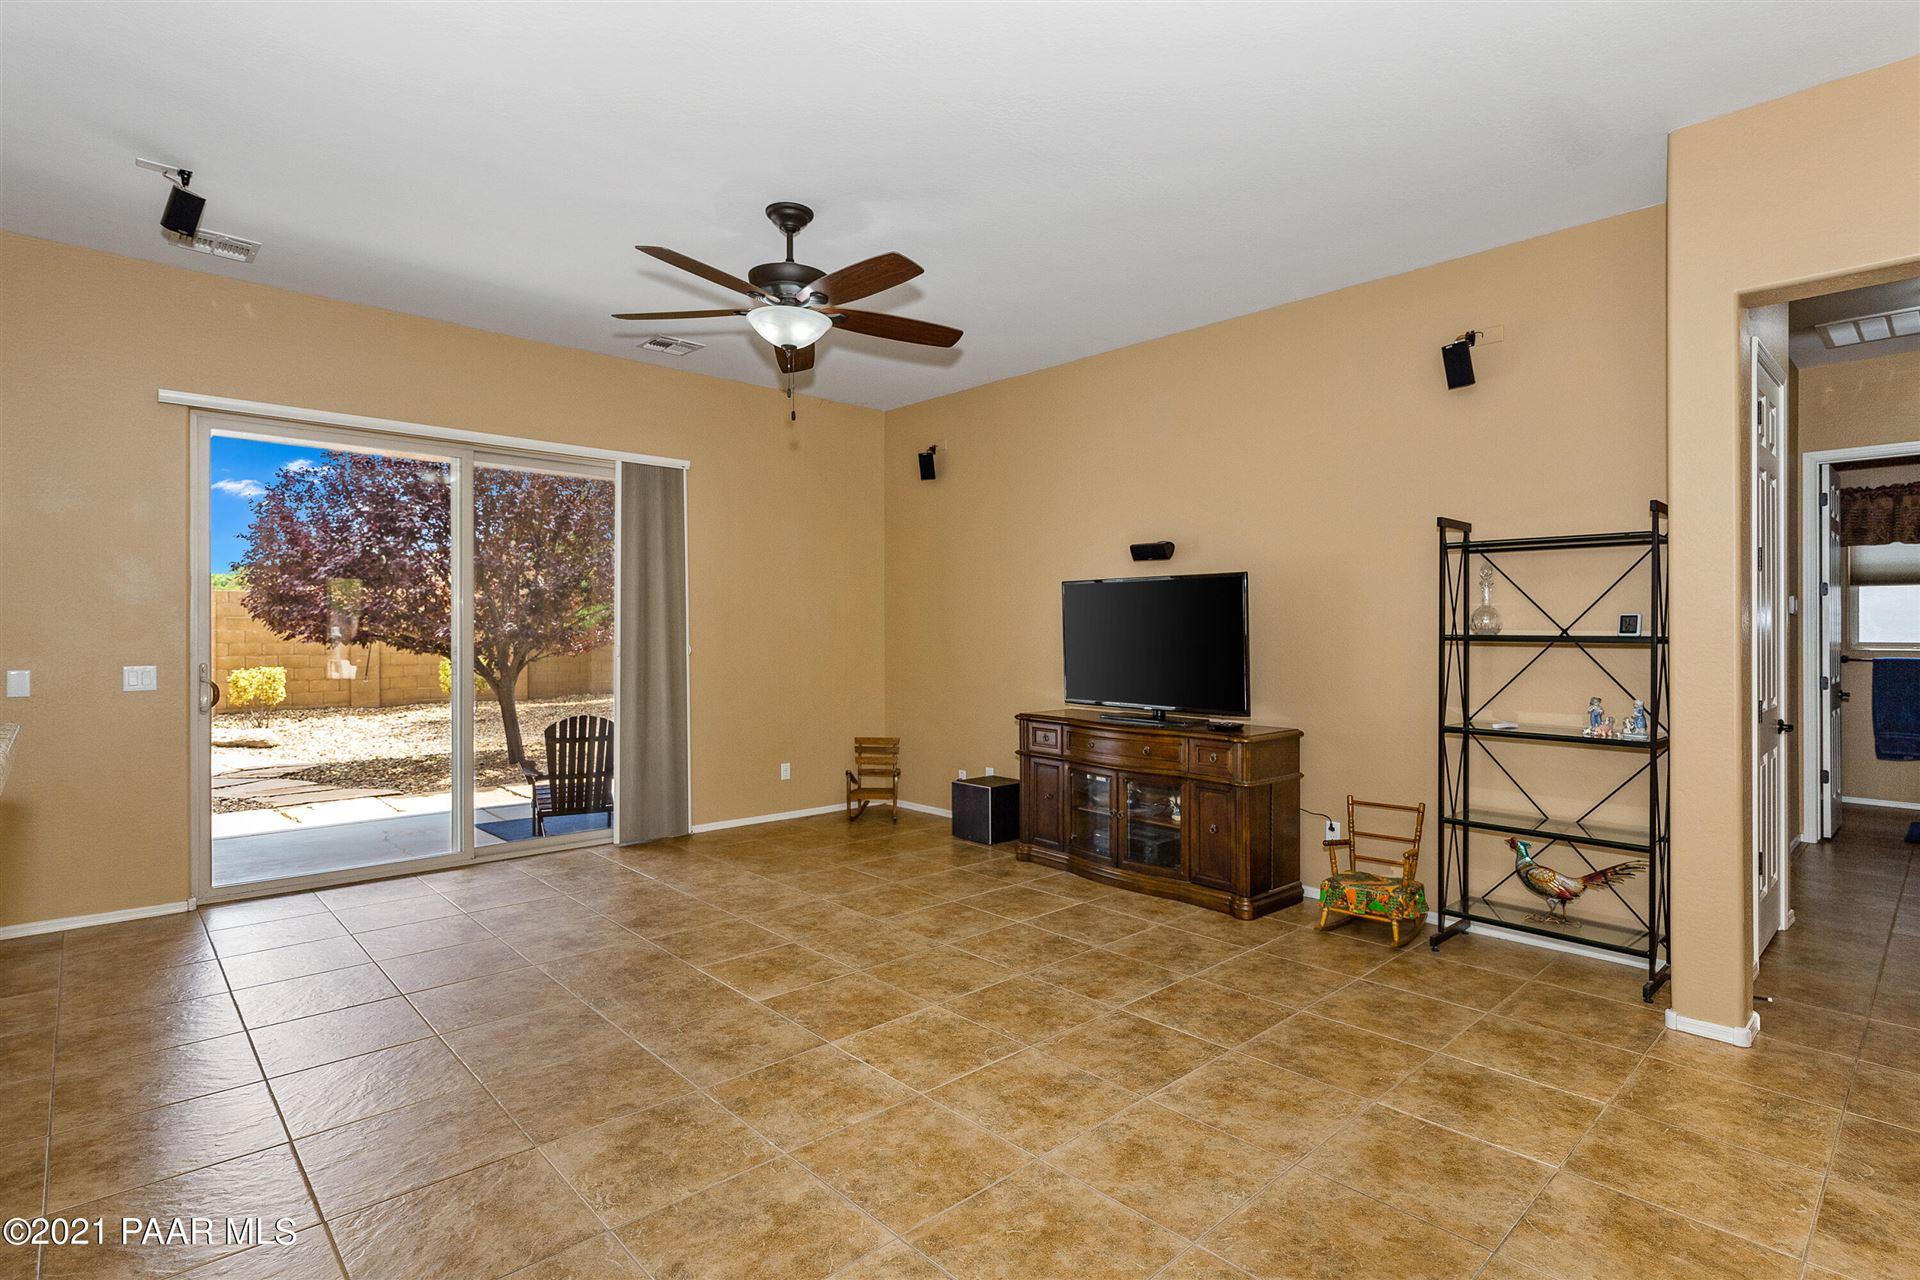 Photo of 3871 N Fairfax Road #Lot: 1337, Prescott Valley, AZ 86314 (MLS # 1040387)